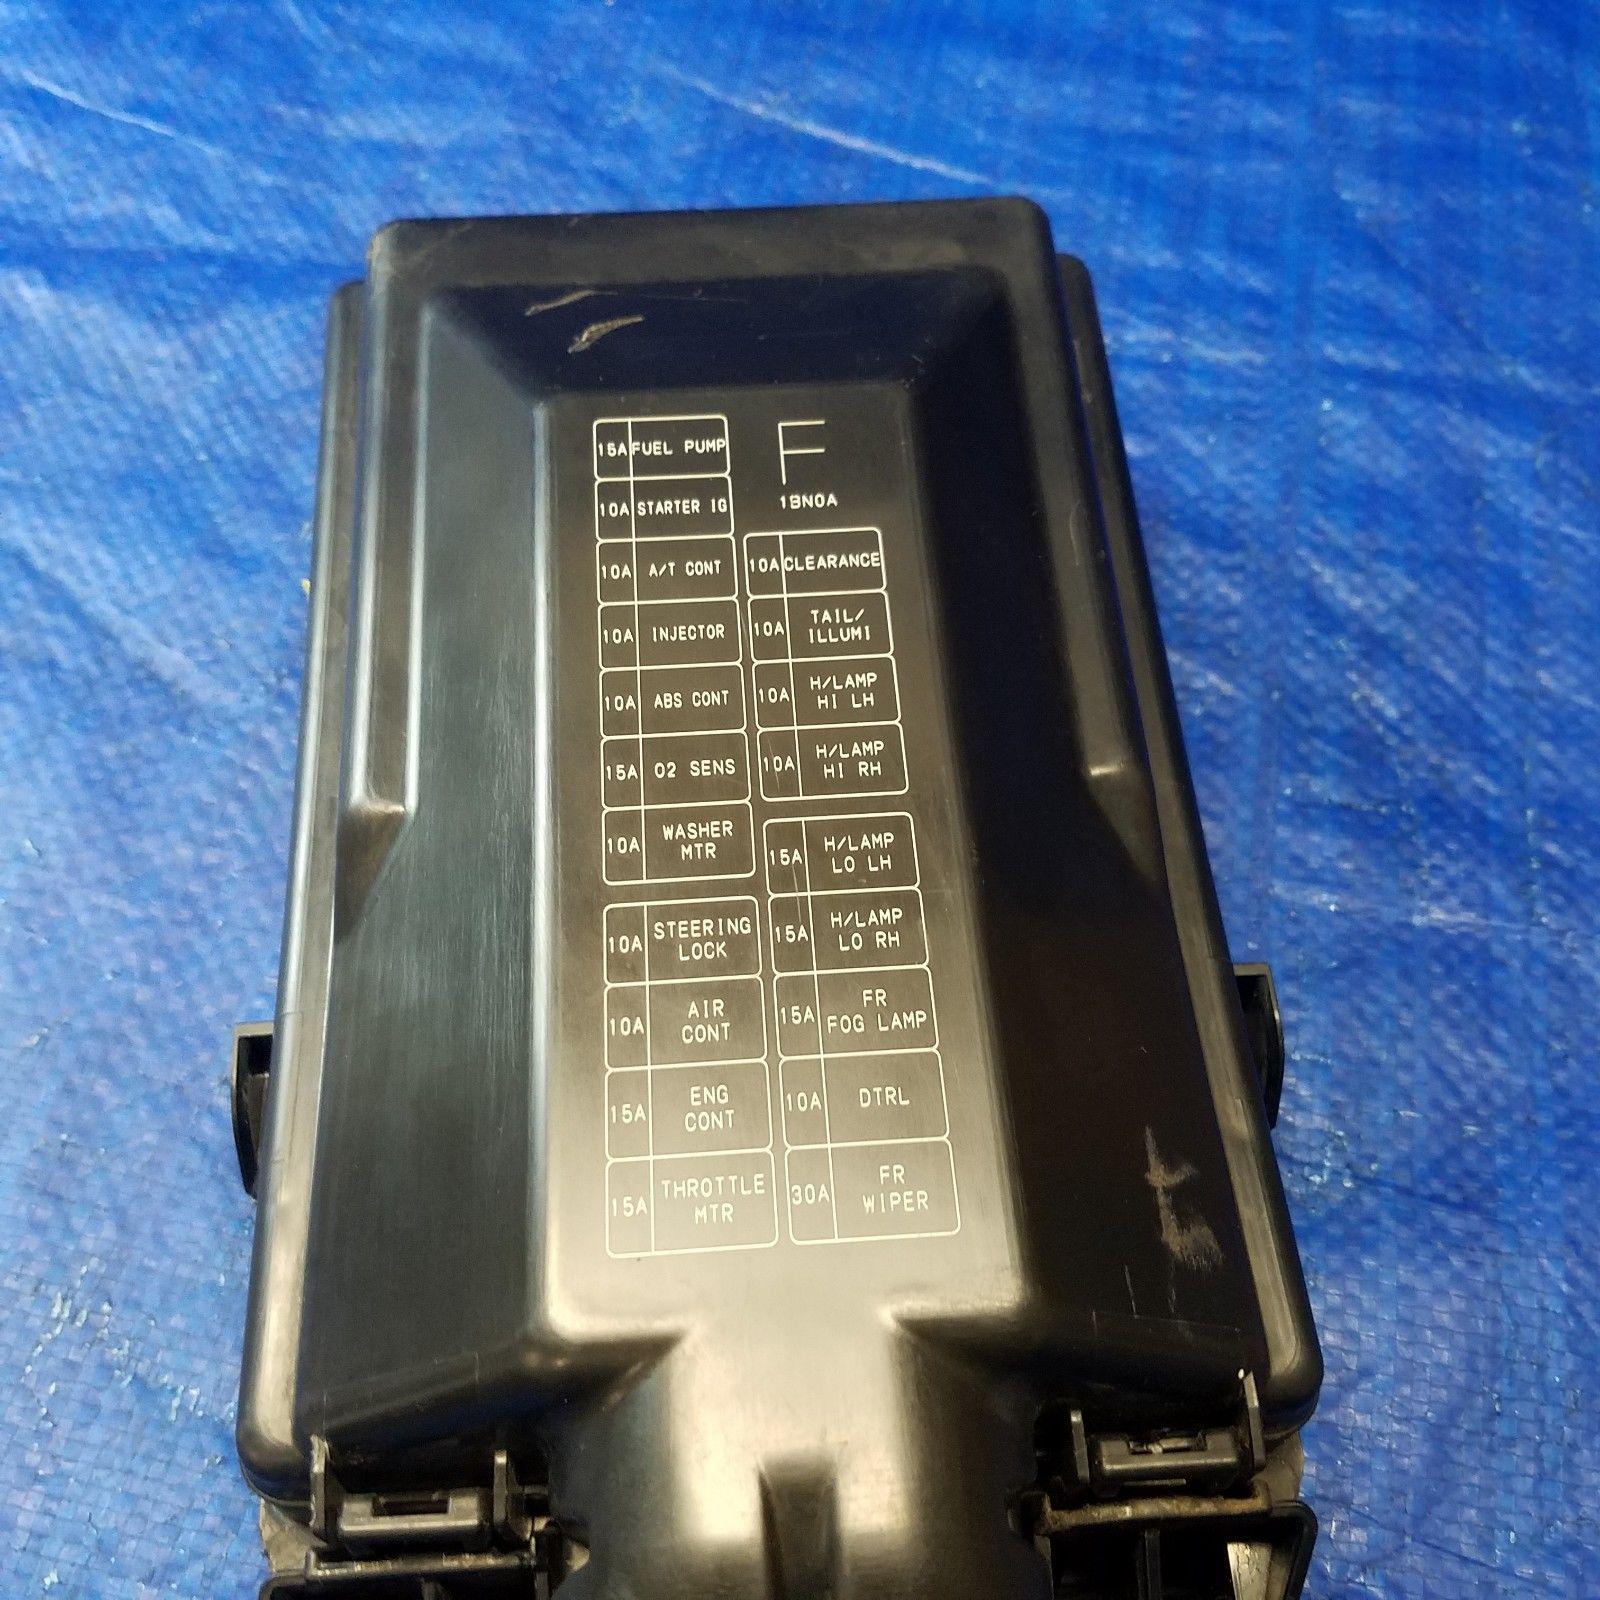 fuse box in infiniti g35 ln 9616  2008 g35 fuse box diagram  ln 9616  2008 g35 fuse box diagram